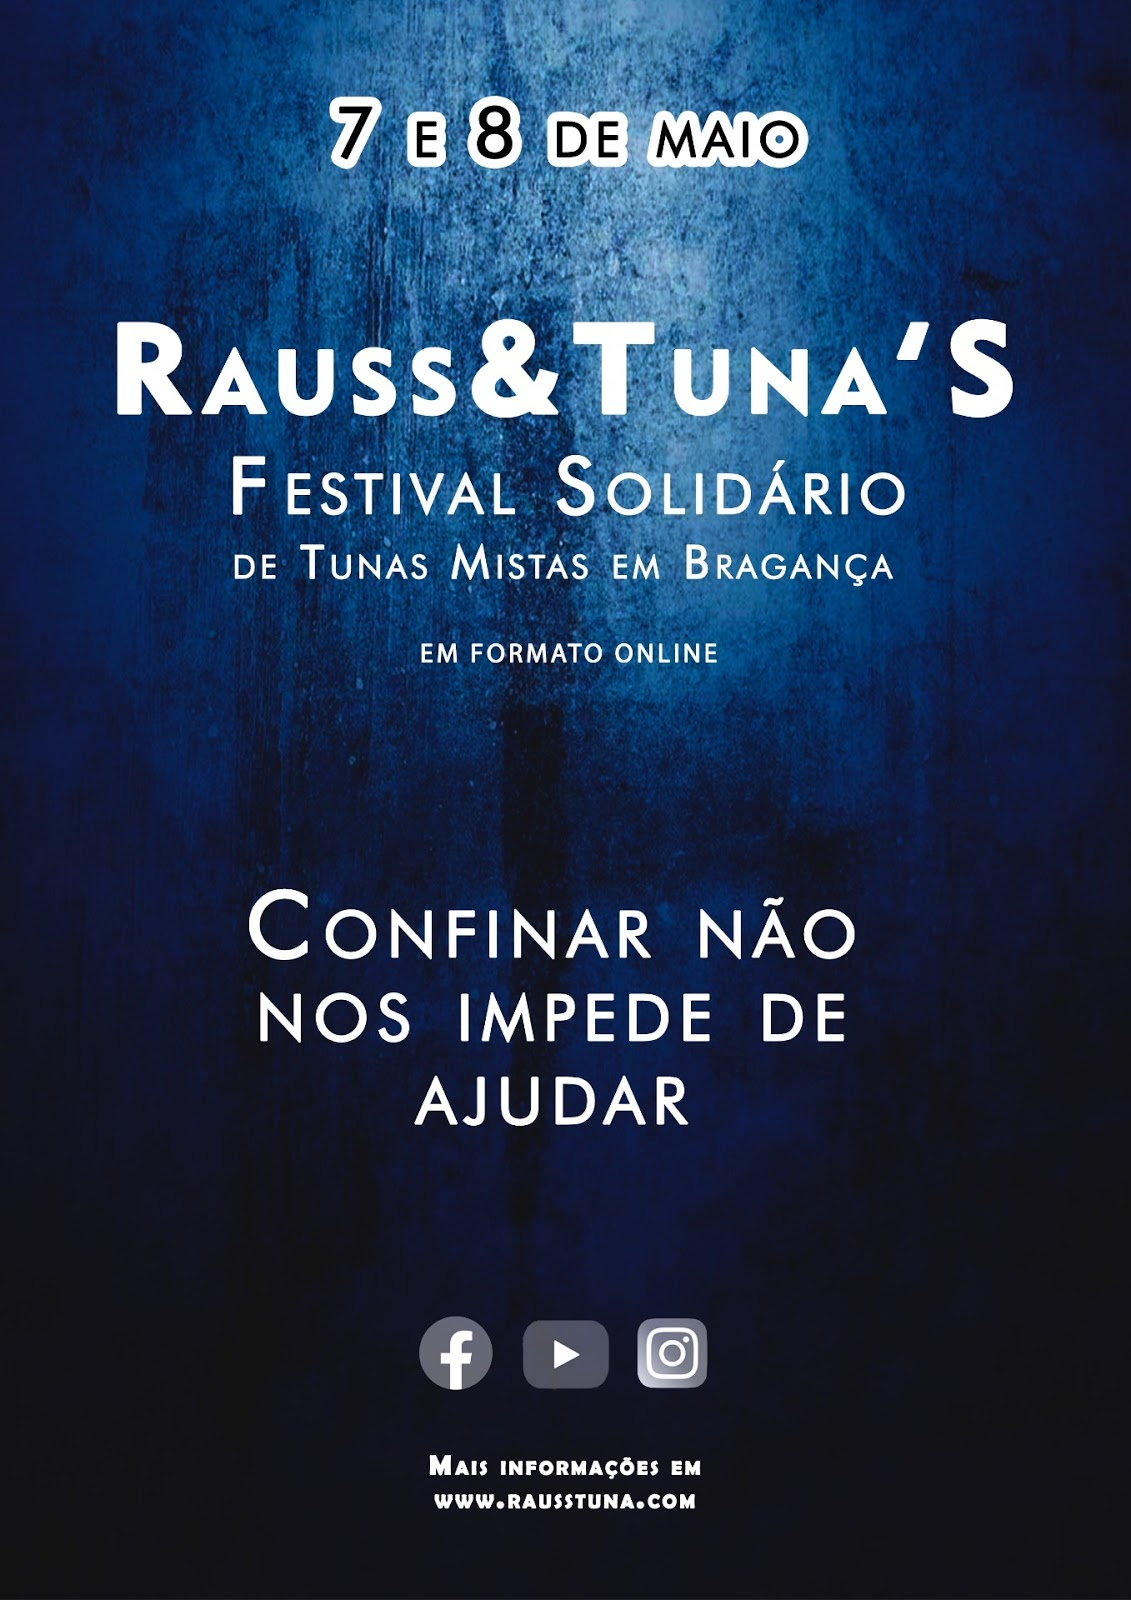 VIII Rauss&Tuna'Tuna'S